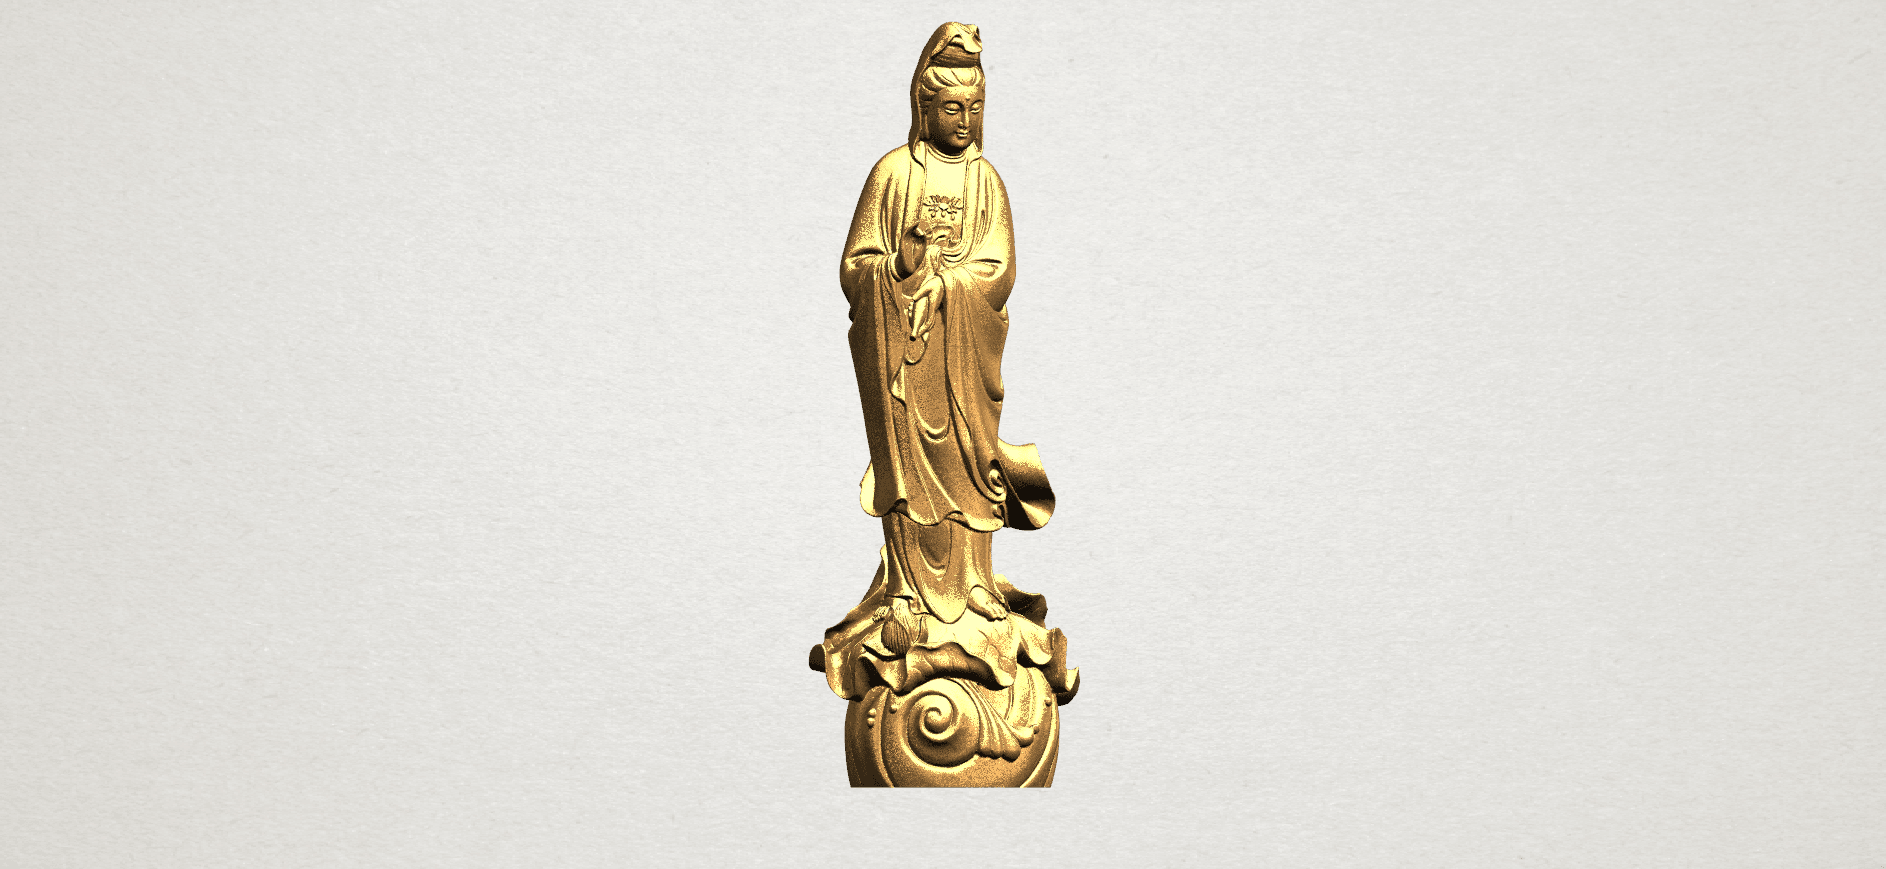 Avalokitesvara Buddha - Standing (i) A08.png Télécharger fichier STL gratuit Avalokitesvara Bodhisattva - Debout 01 • Design à imprimer en 3D, GeorgesNikkei